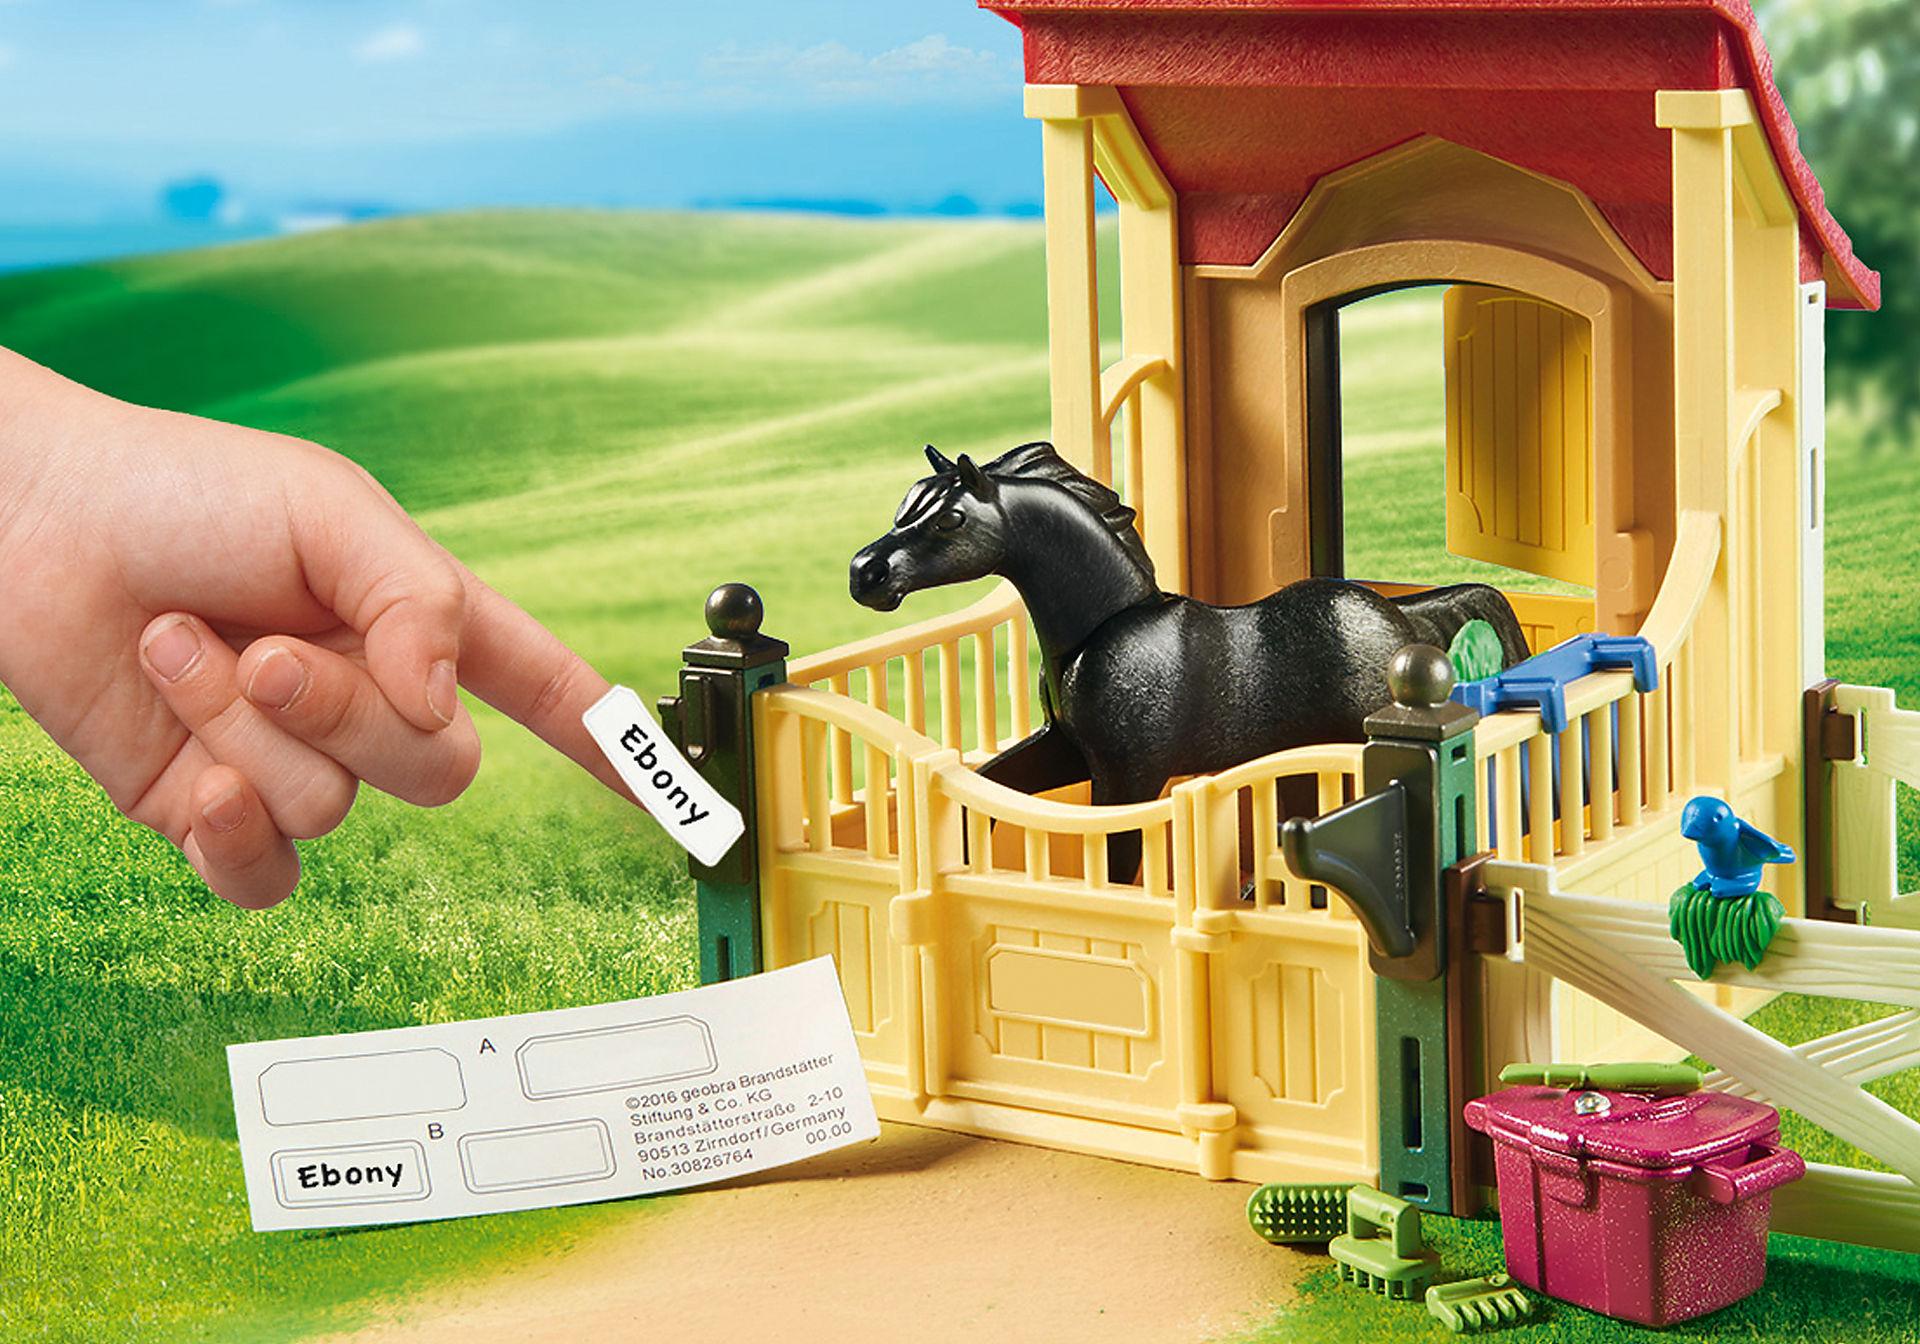 http://media.playmobil.com/i/playmobil/6934_product_extra1/Arabier met paardenbox